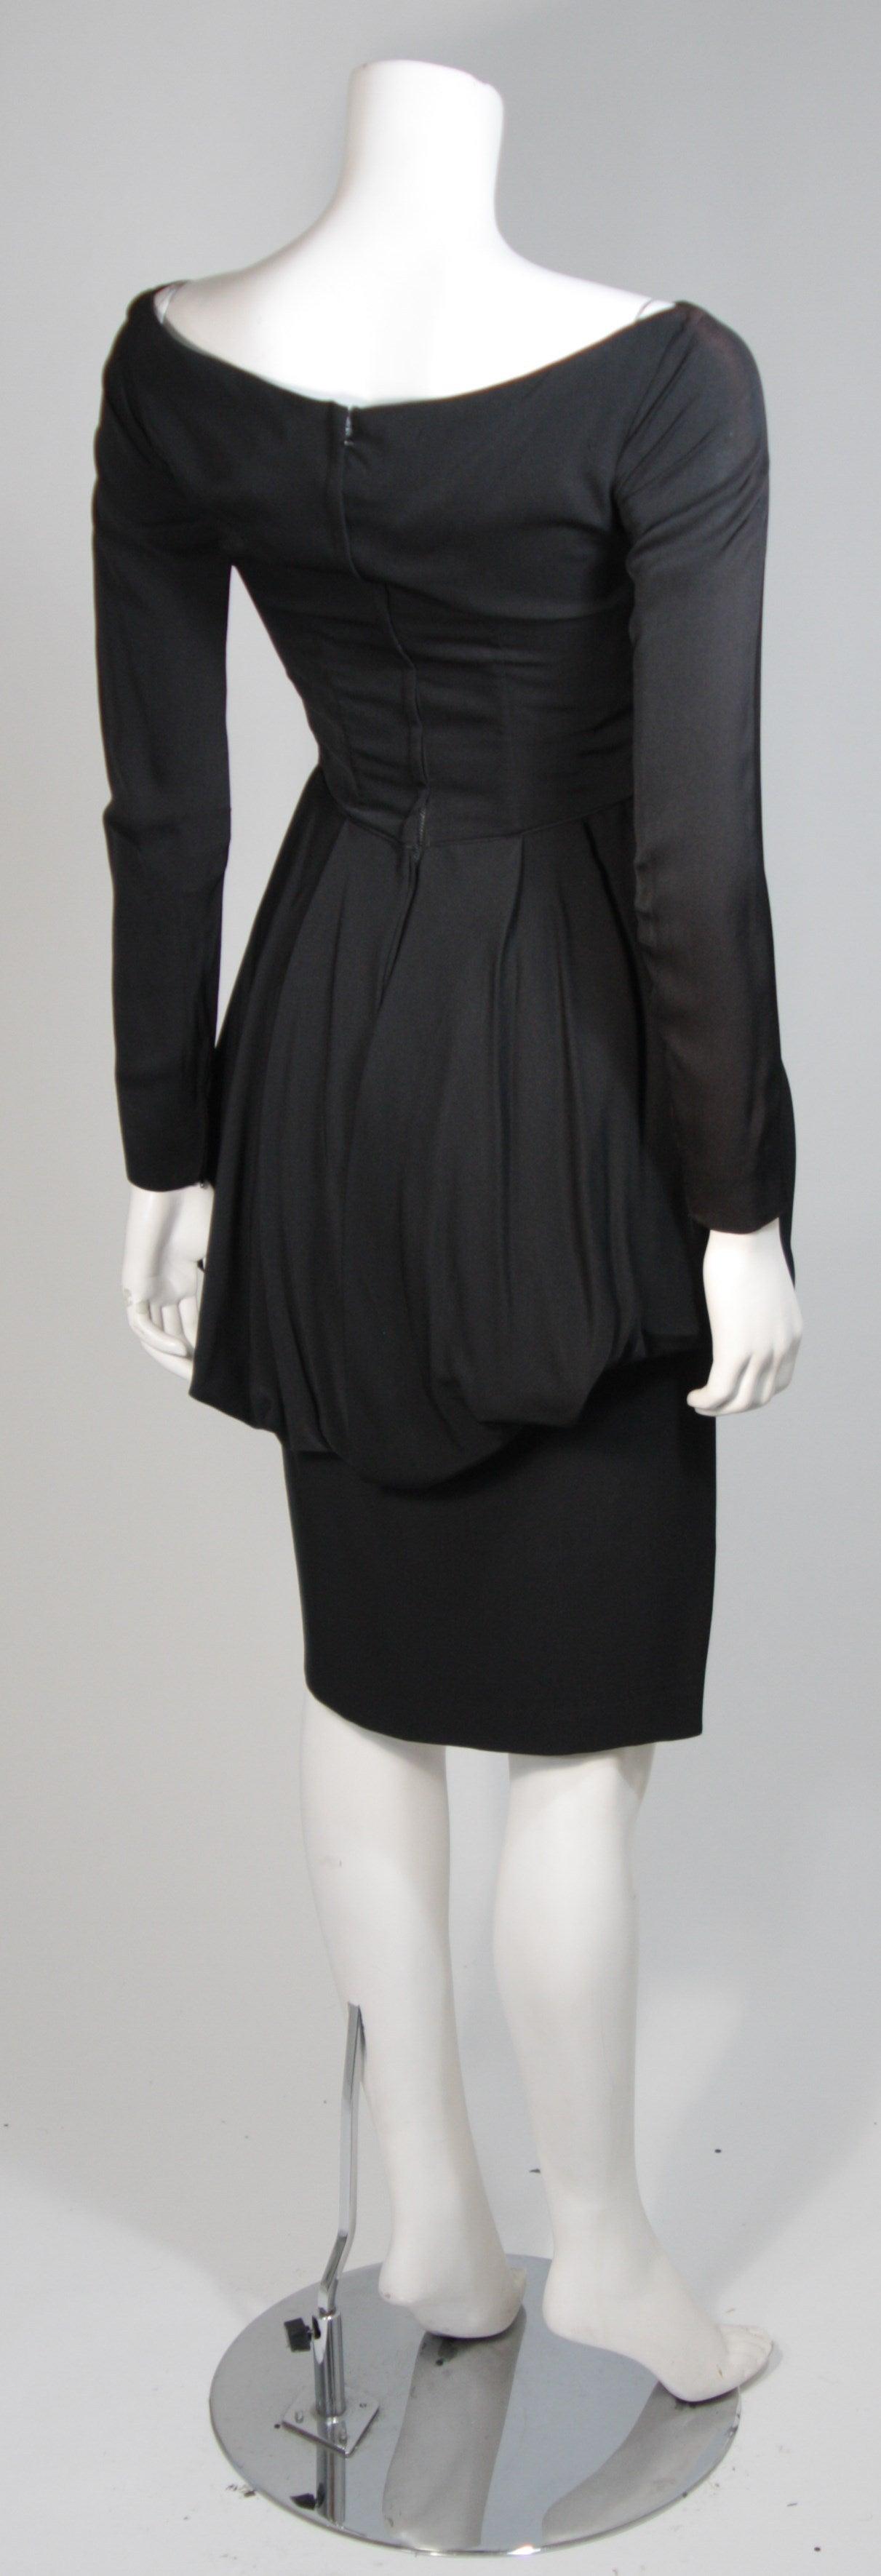 Ceil Chapman Black Draped Princess Seam Peplum Style Waist Dress Size XS 7